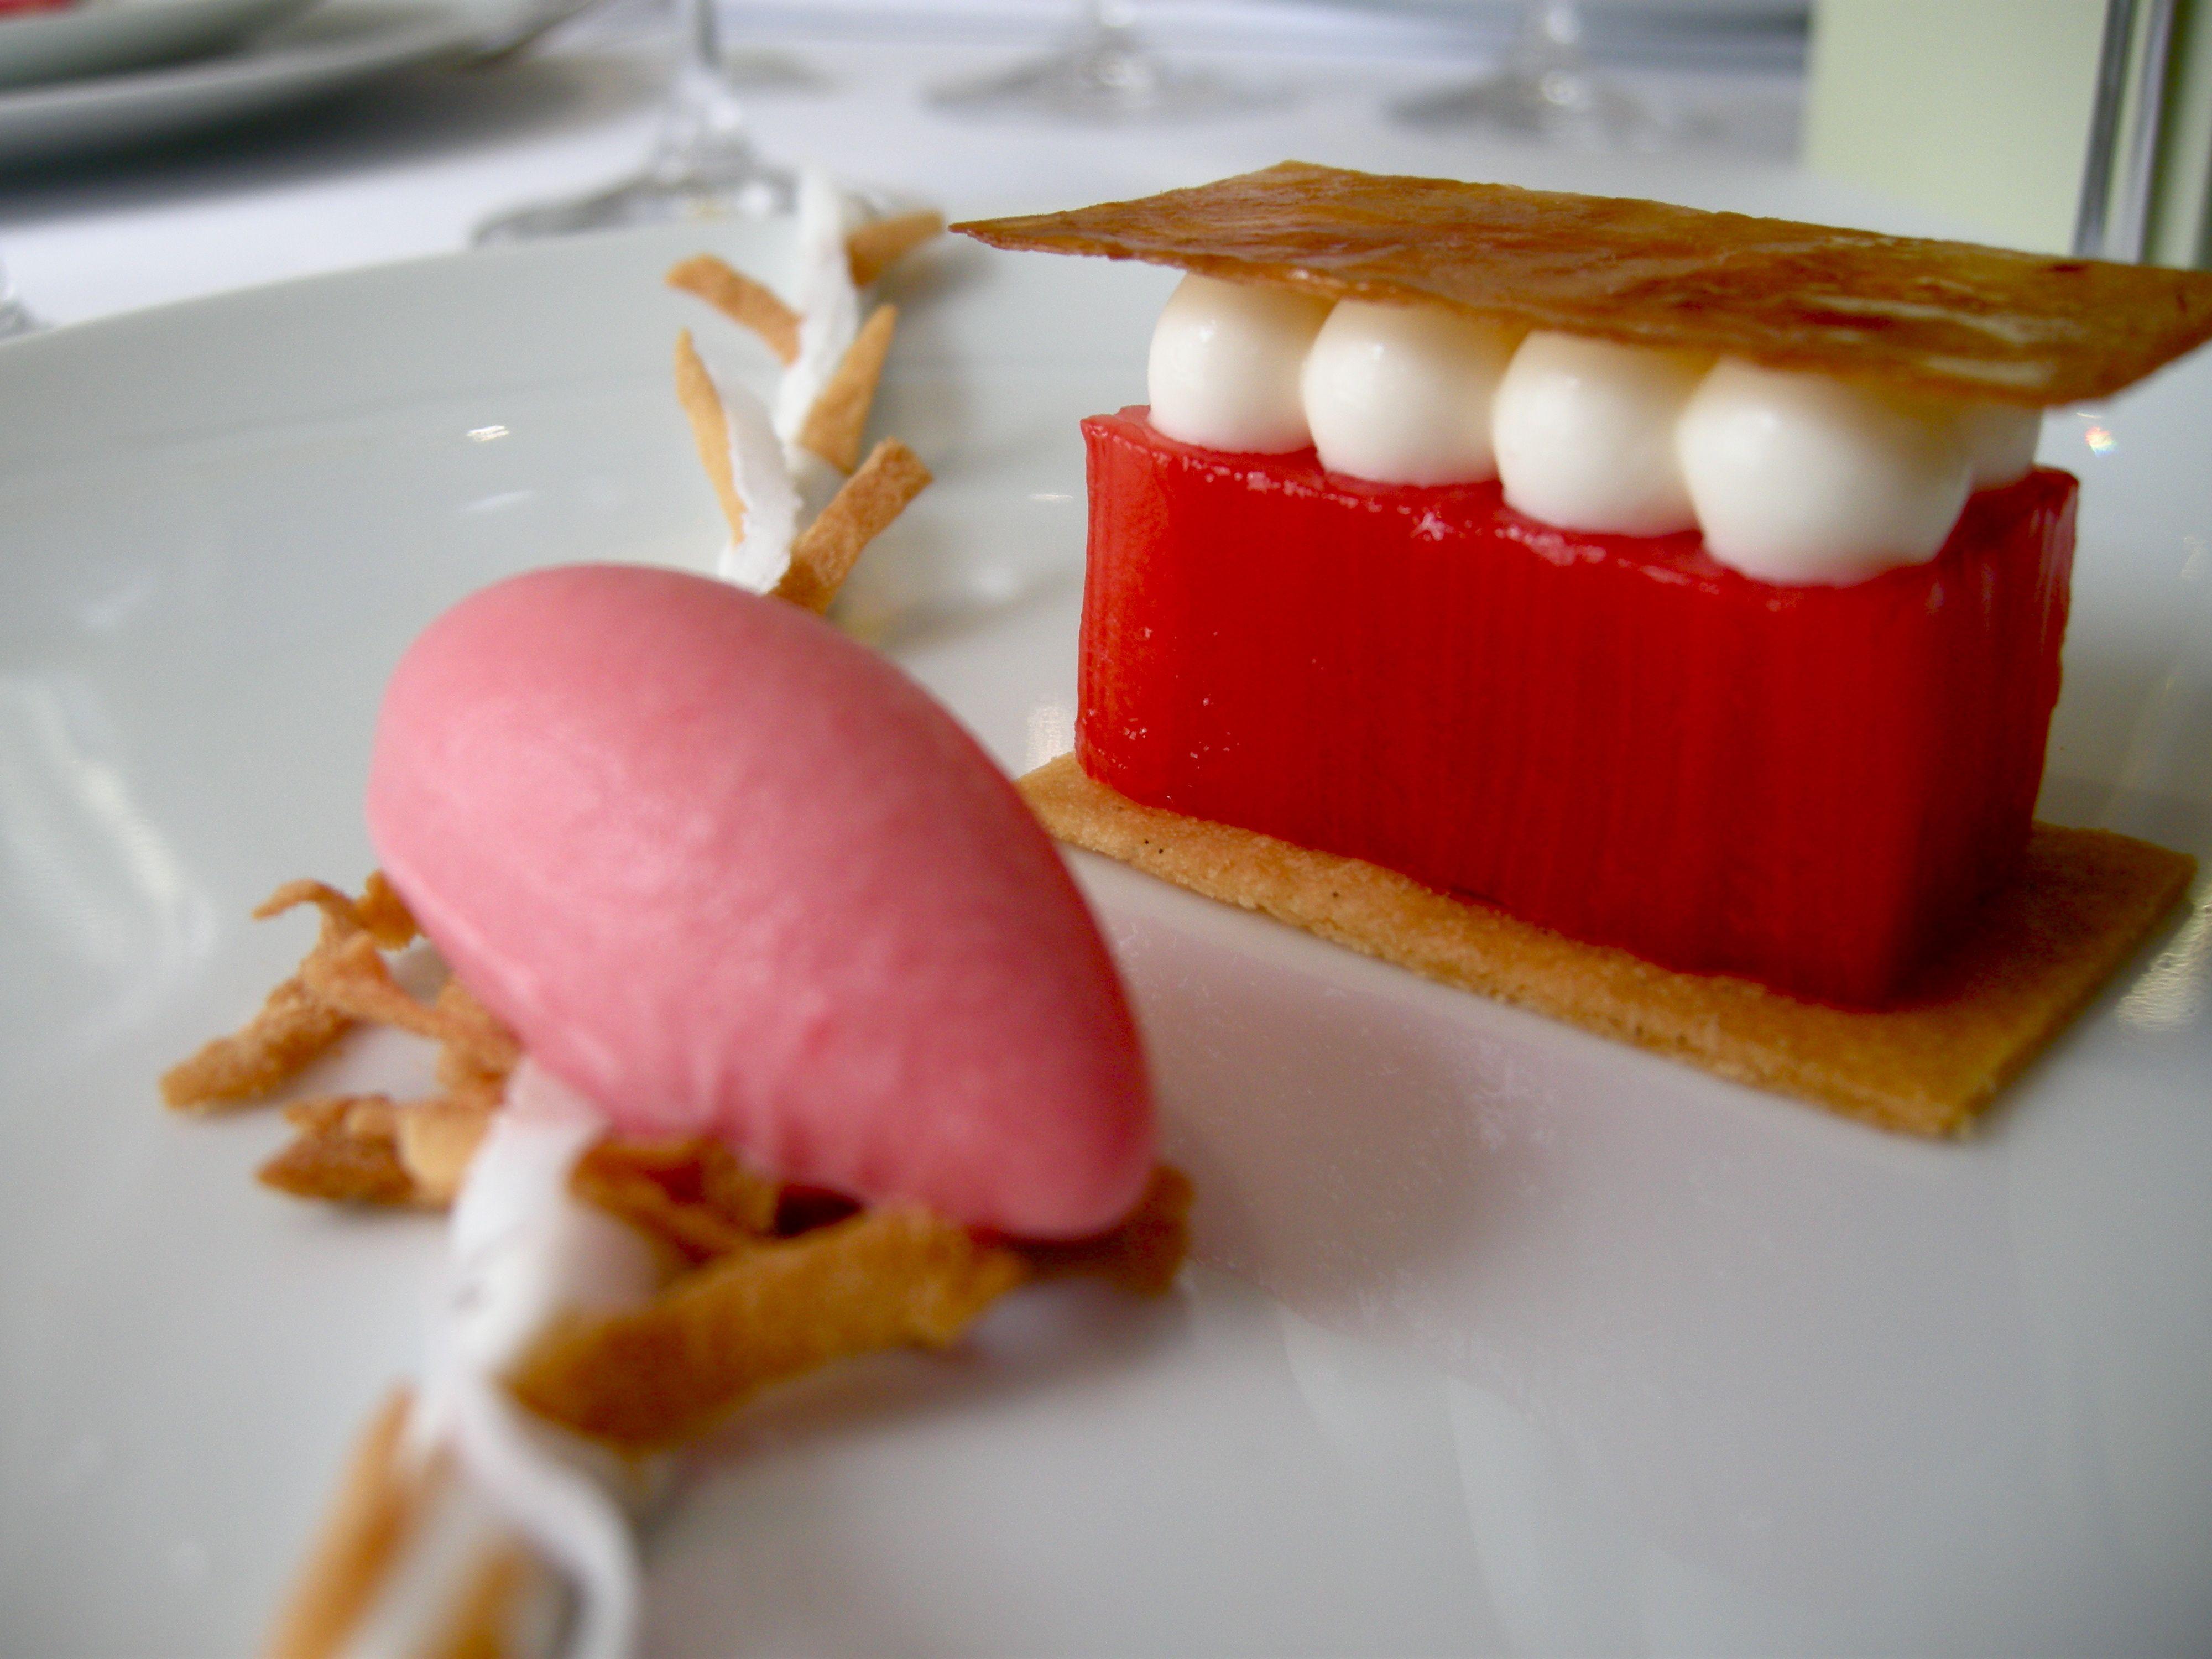 Michelin 3 Felixhirsch S Tour De Table Rhubarb Desserts Desserts Food